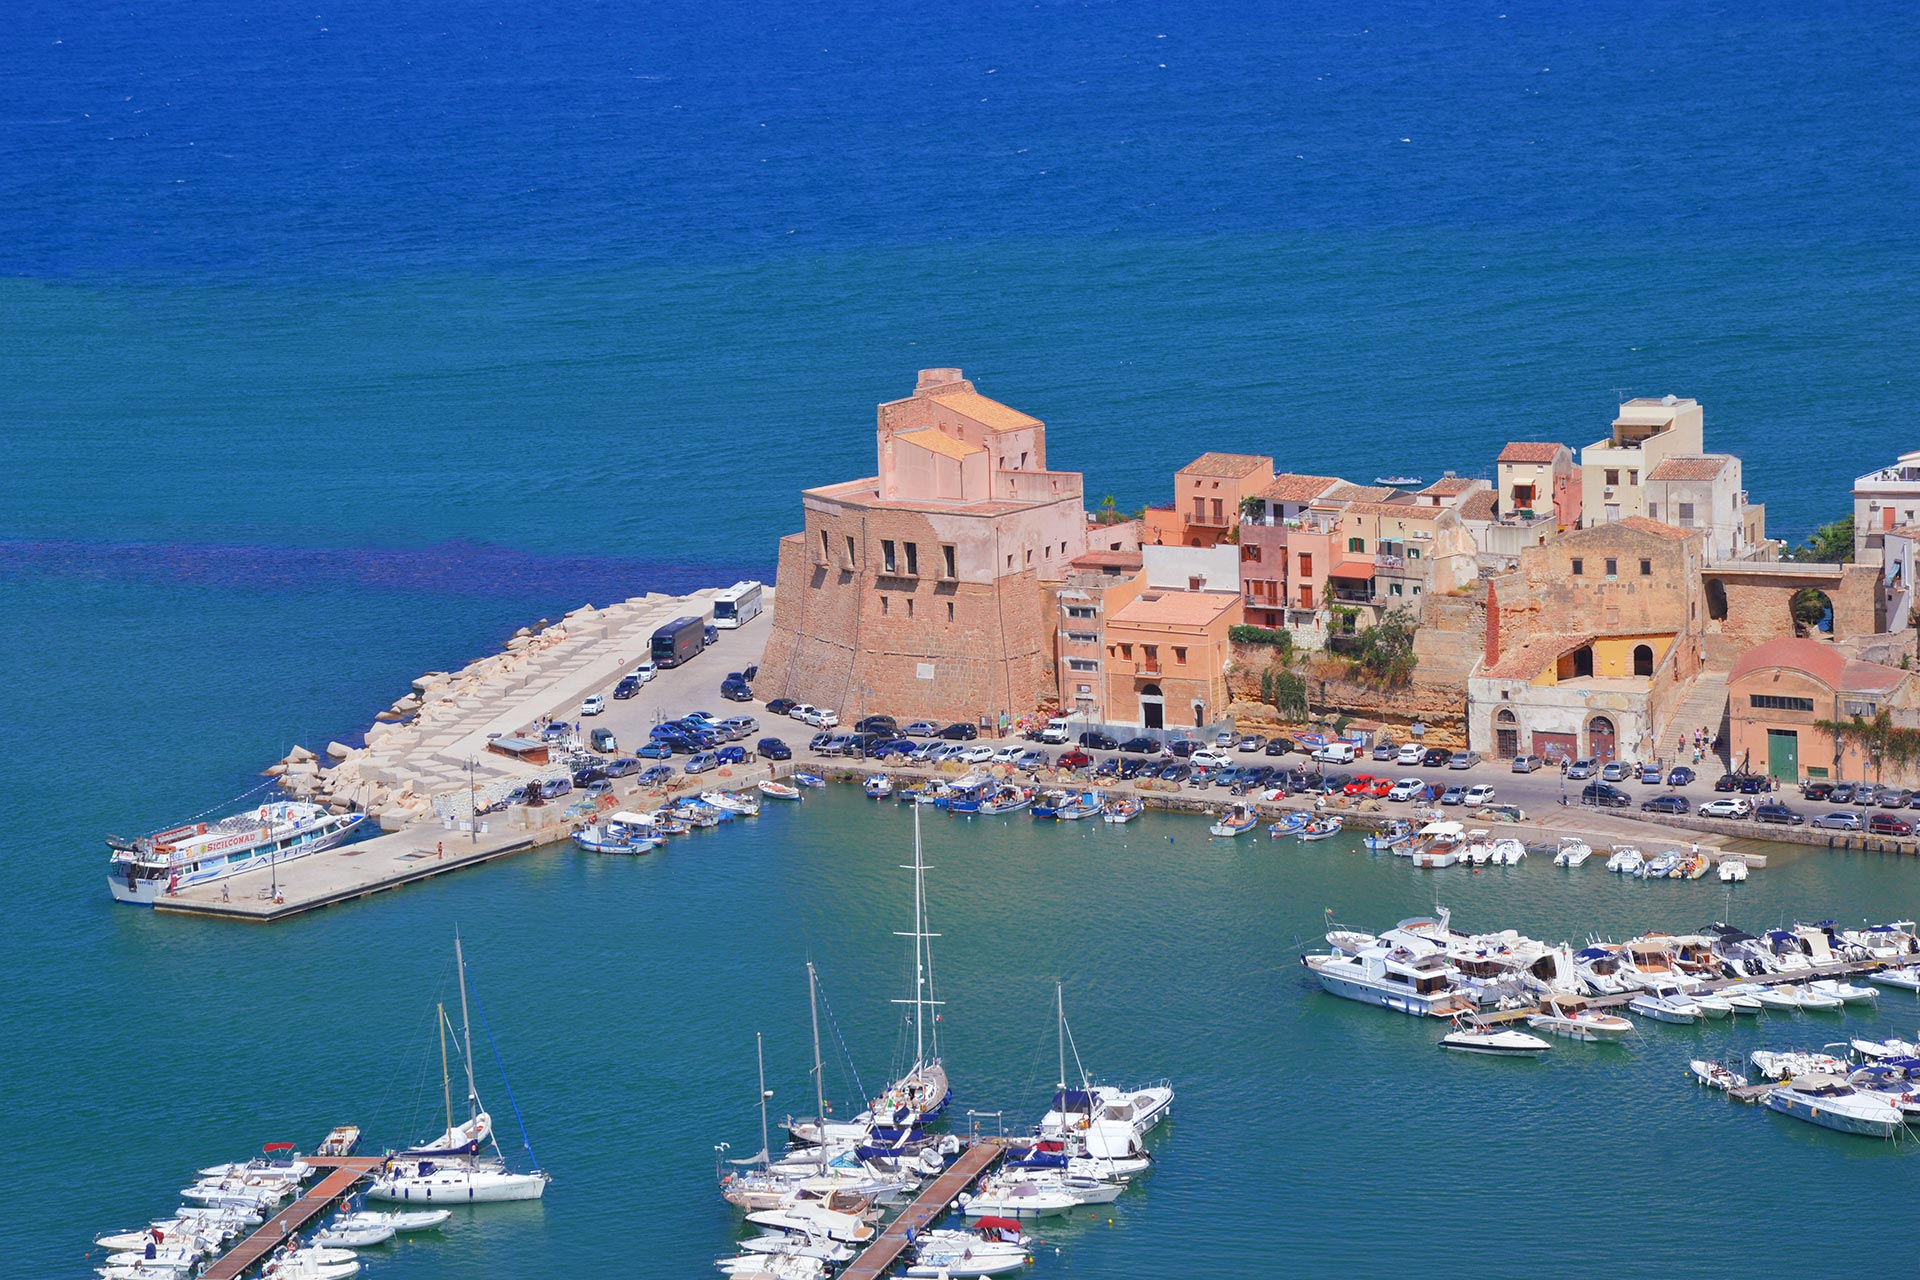 Hafen in Sizilien